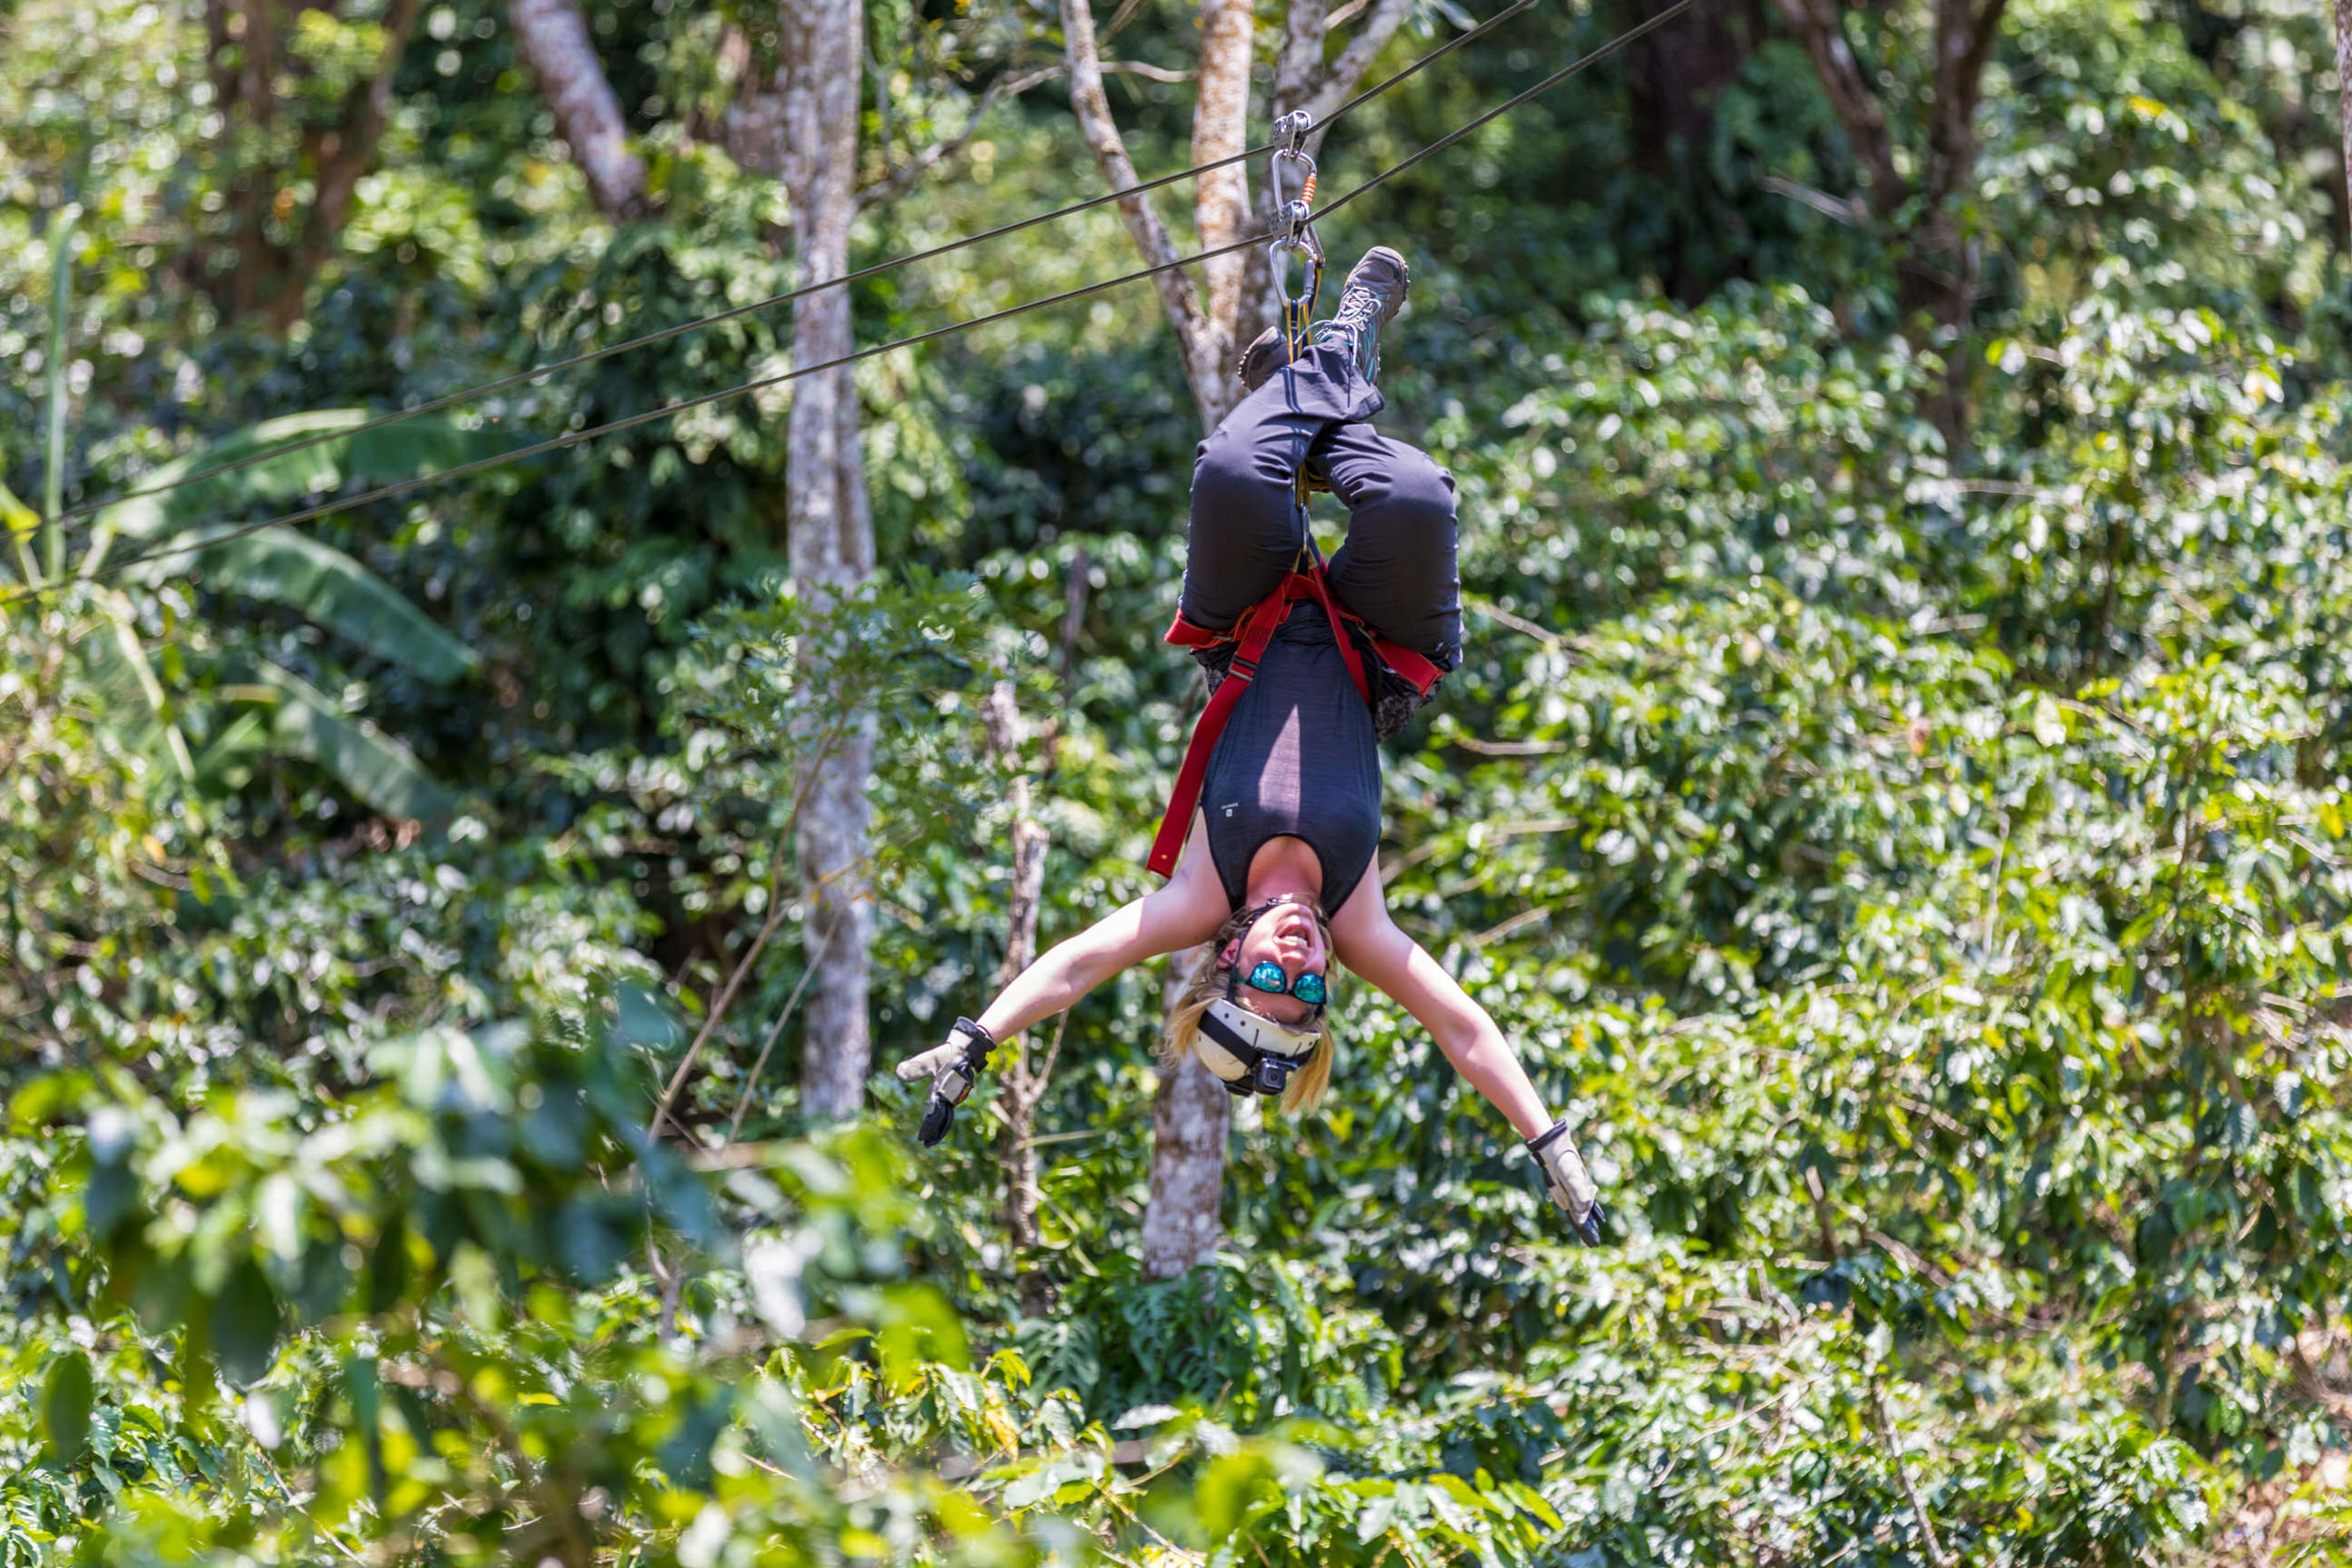 Day 2: Mombacho zipline canopy tour